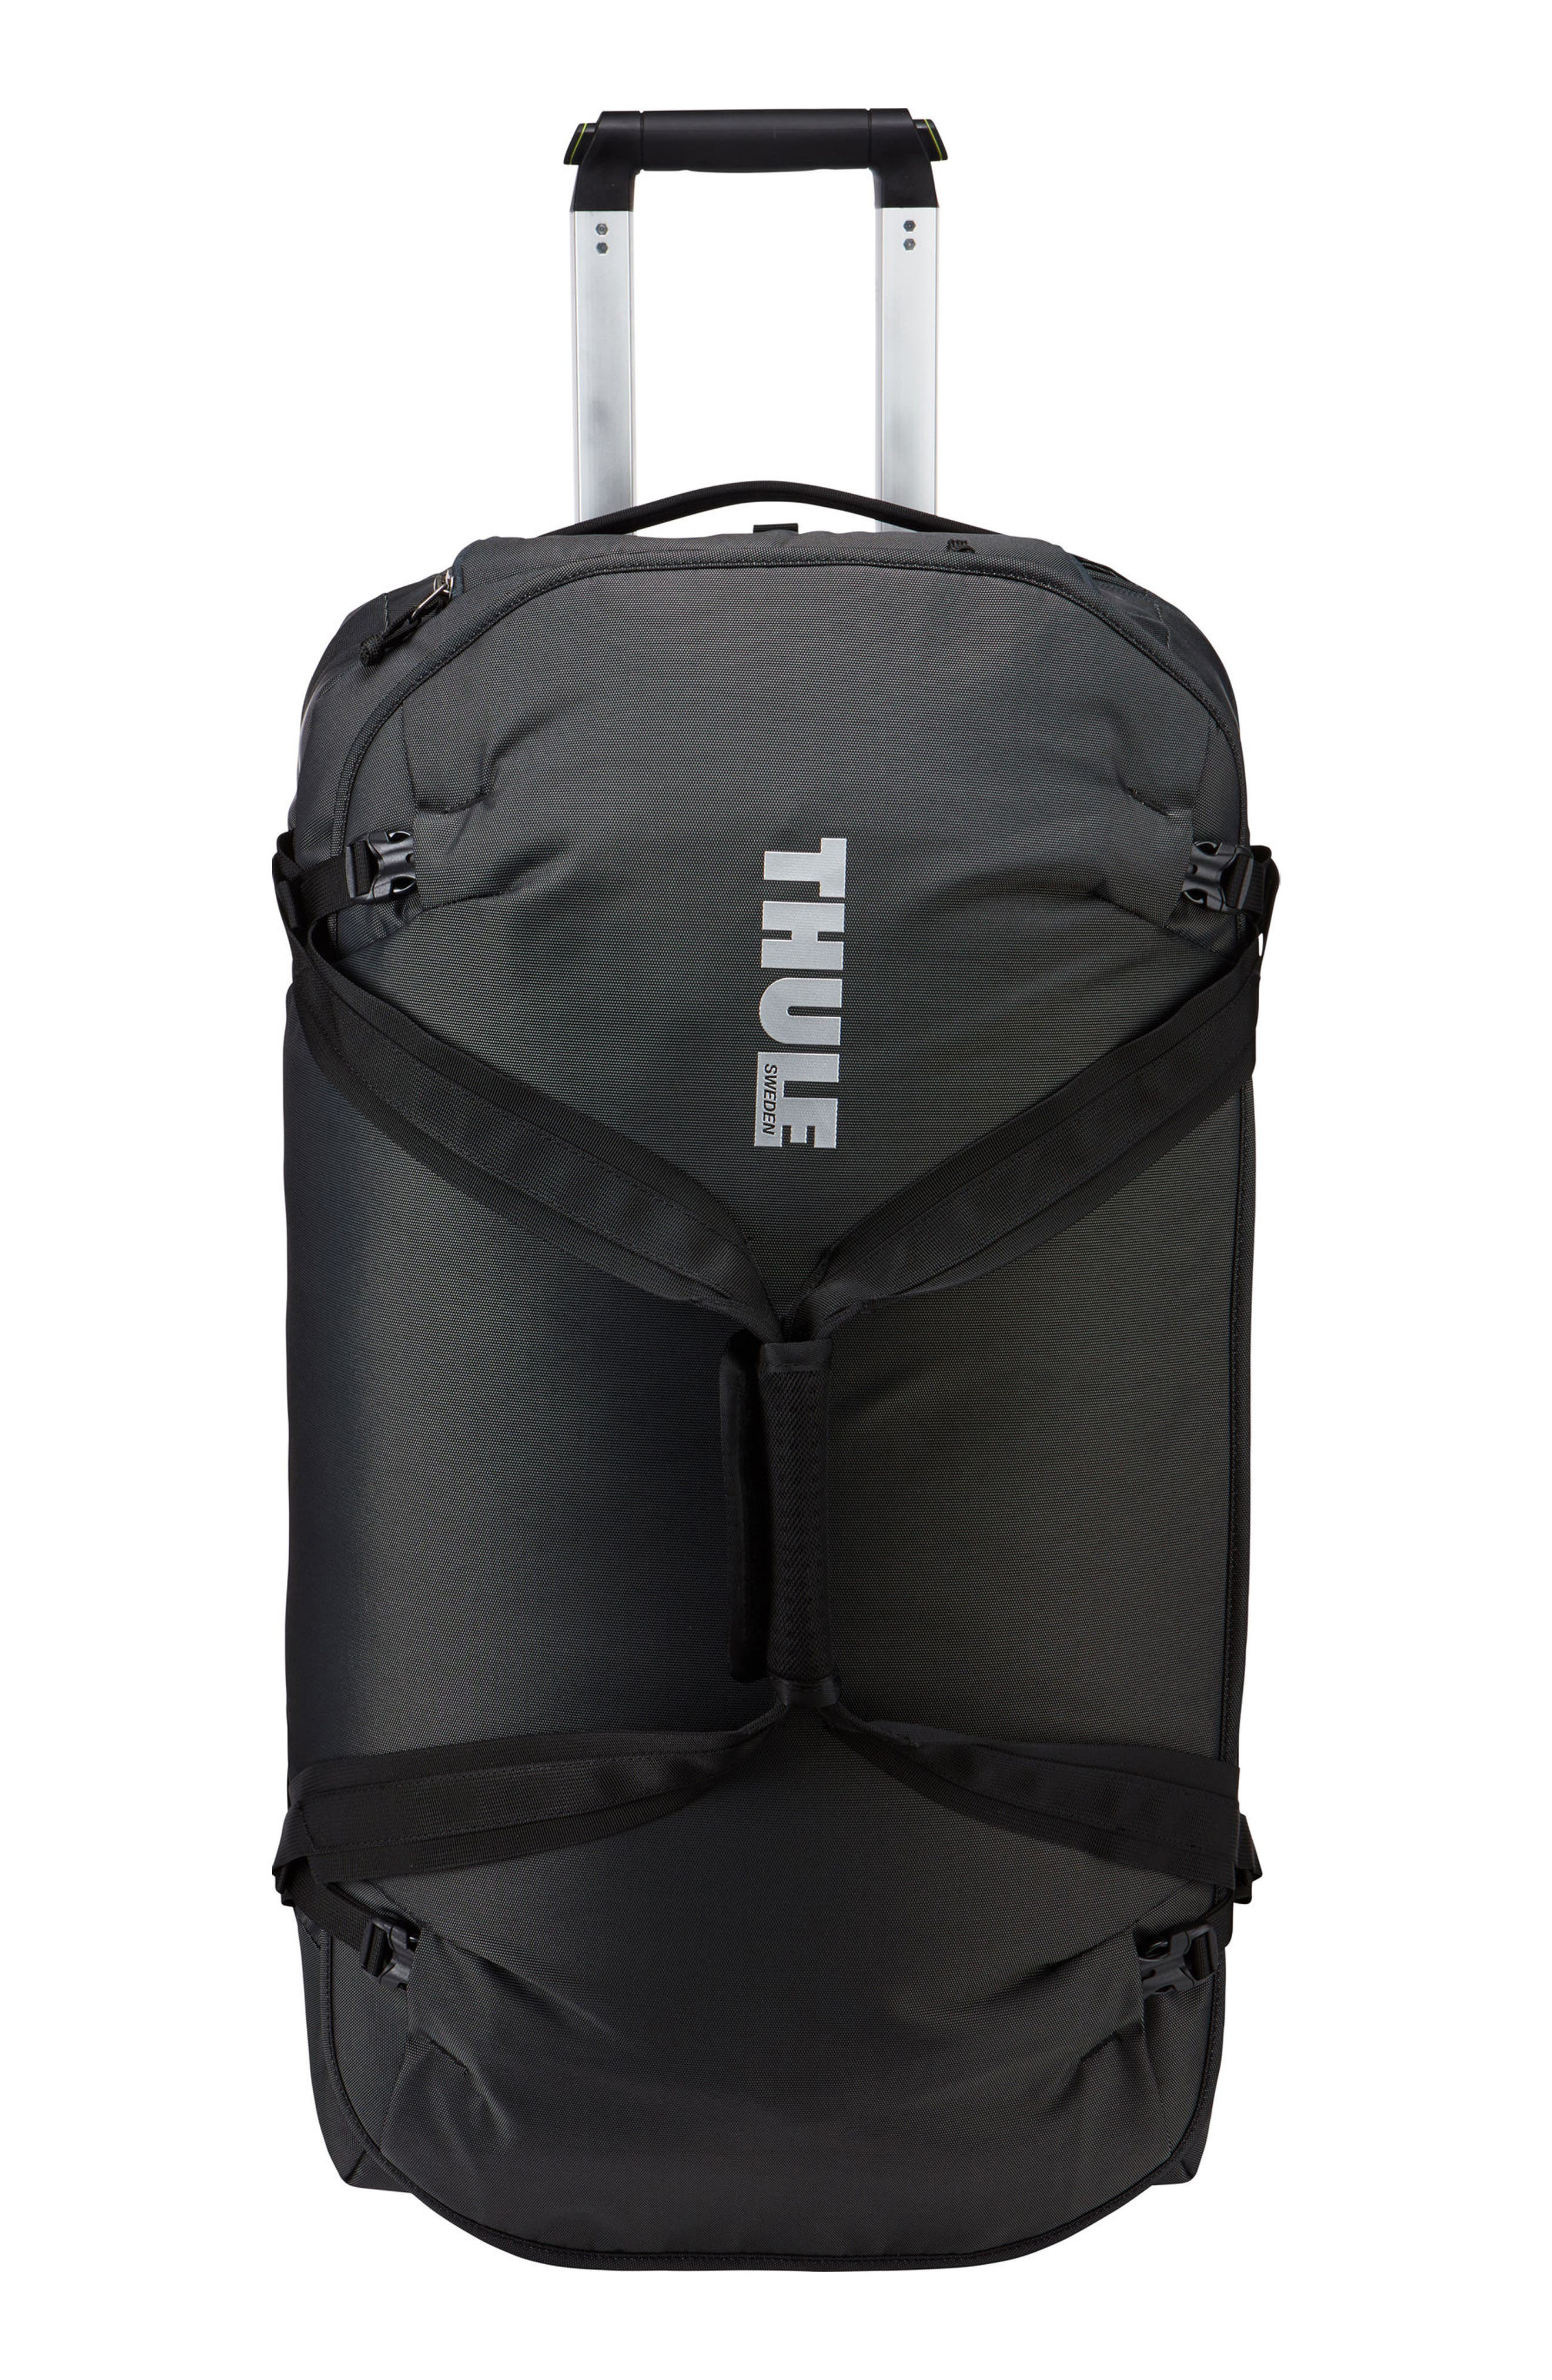 THULE Subterra 28-Inch Suitcase